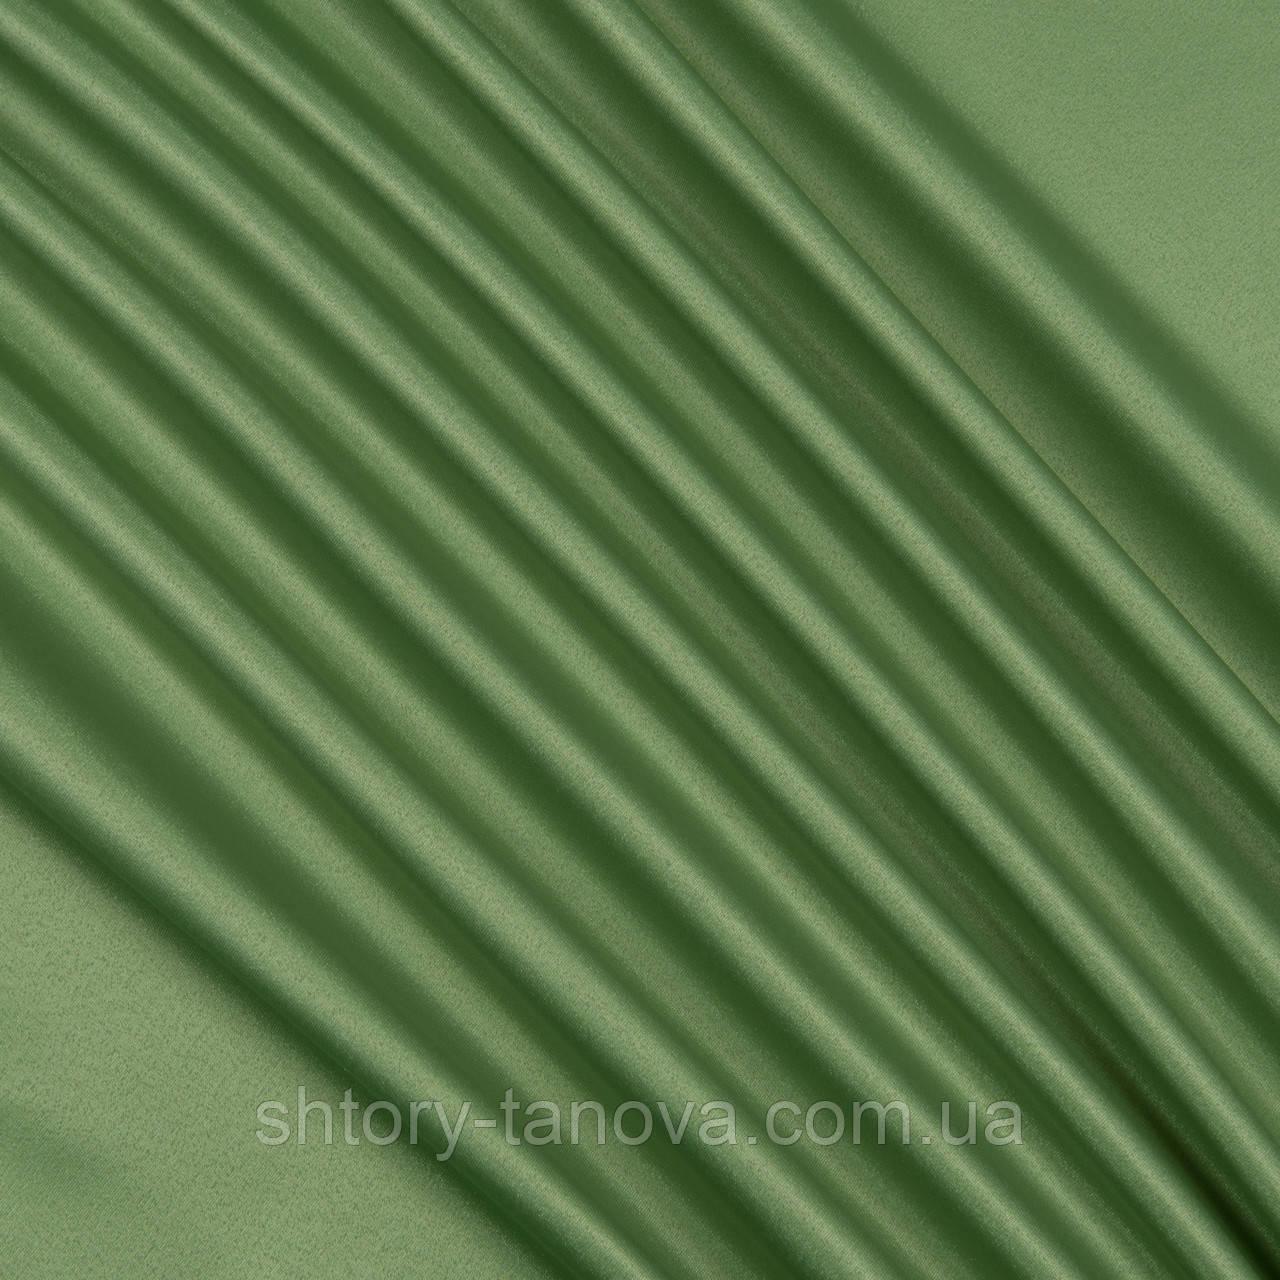 Декоративный атлас корсика зеленый